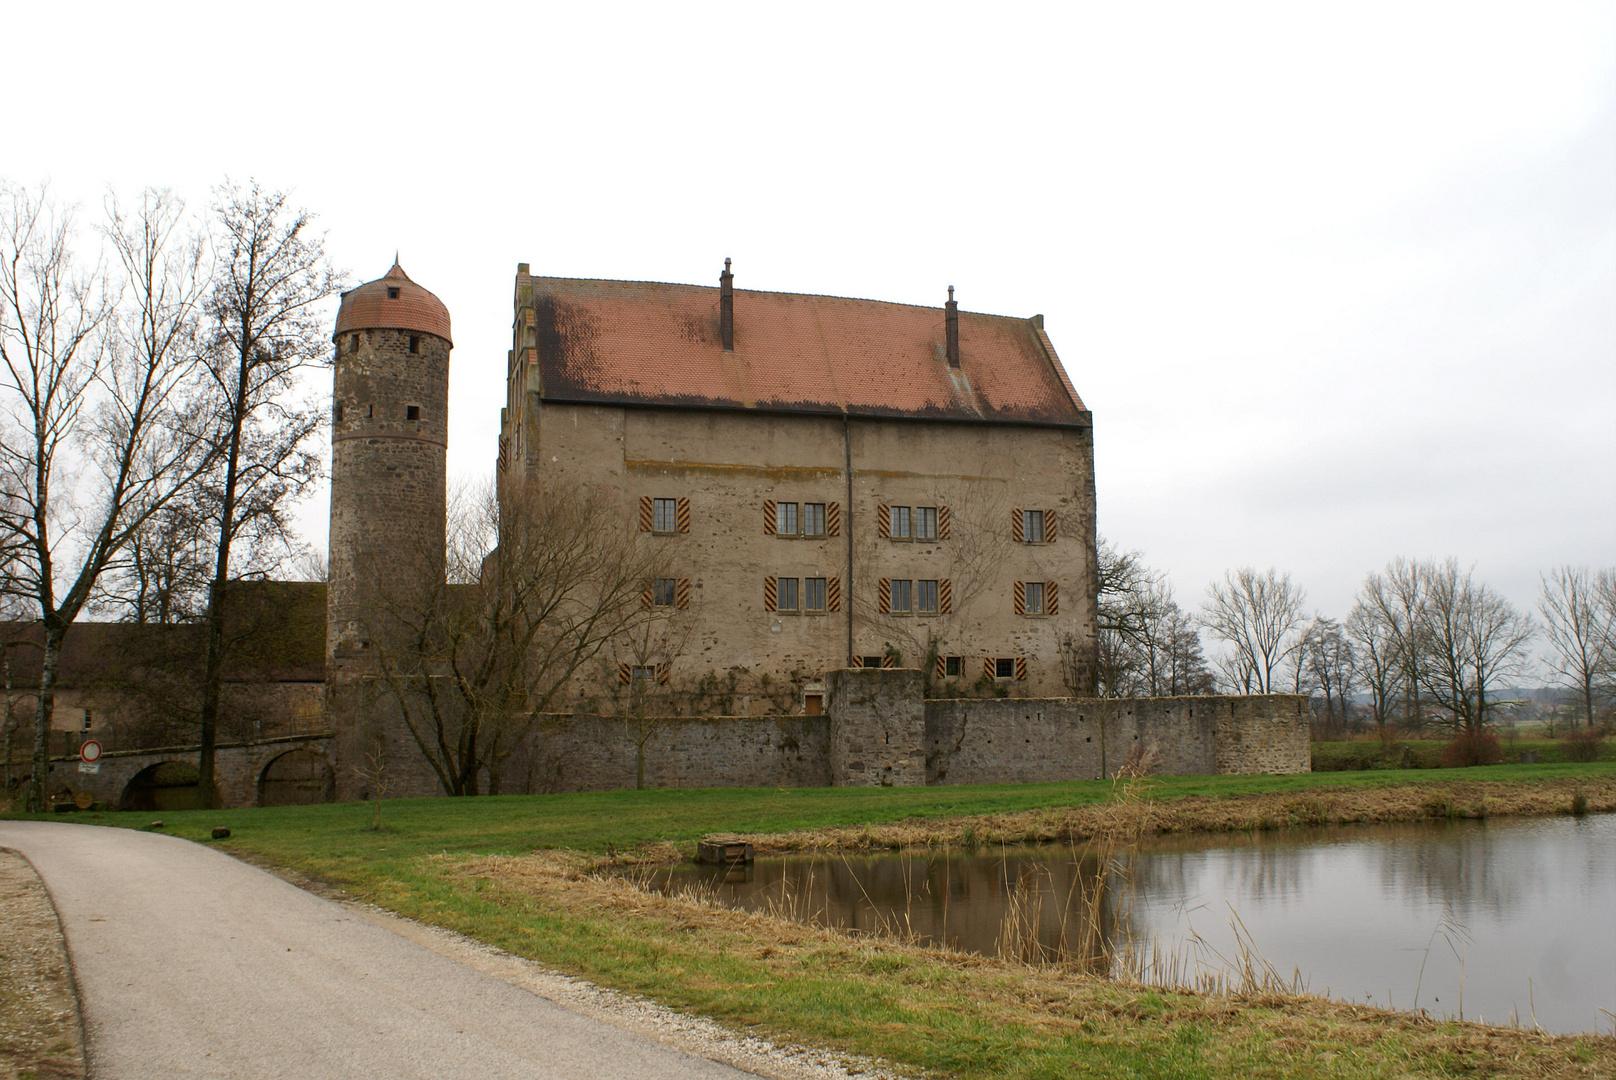 Sommersdorf 1